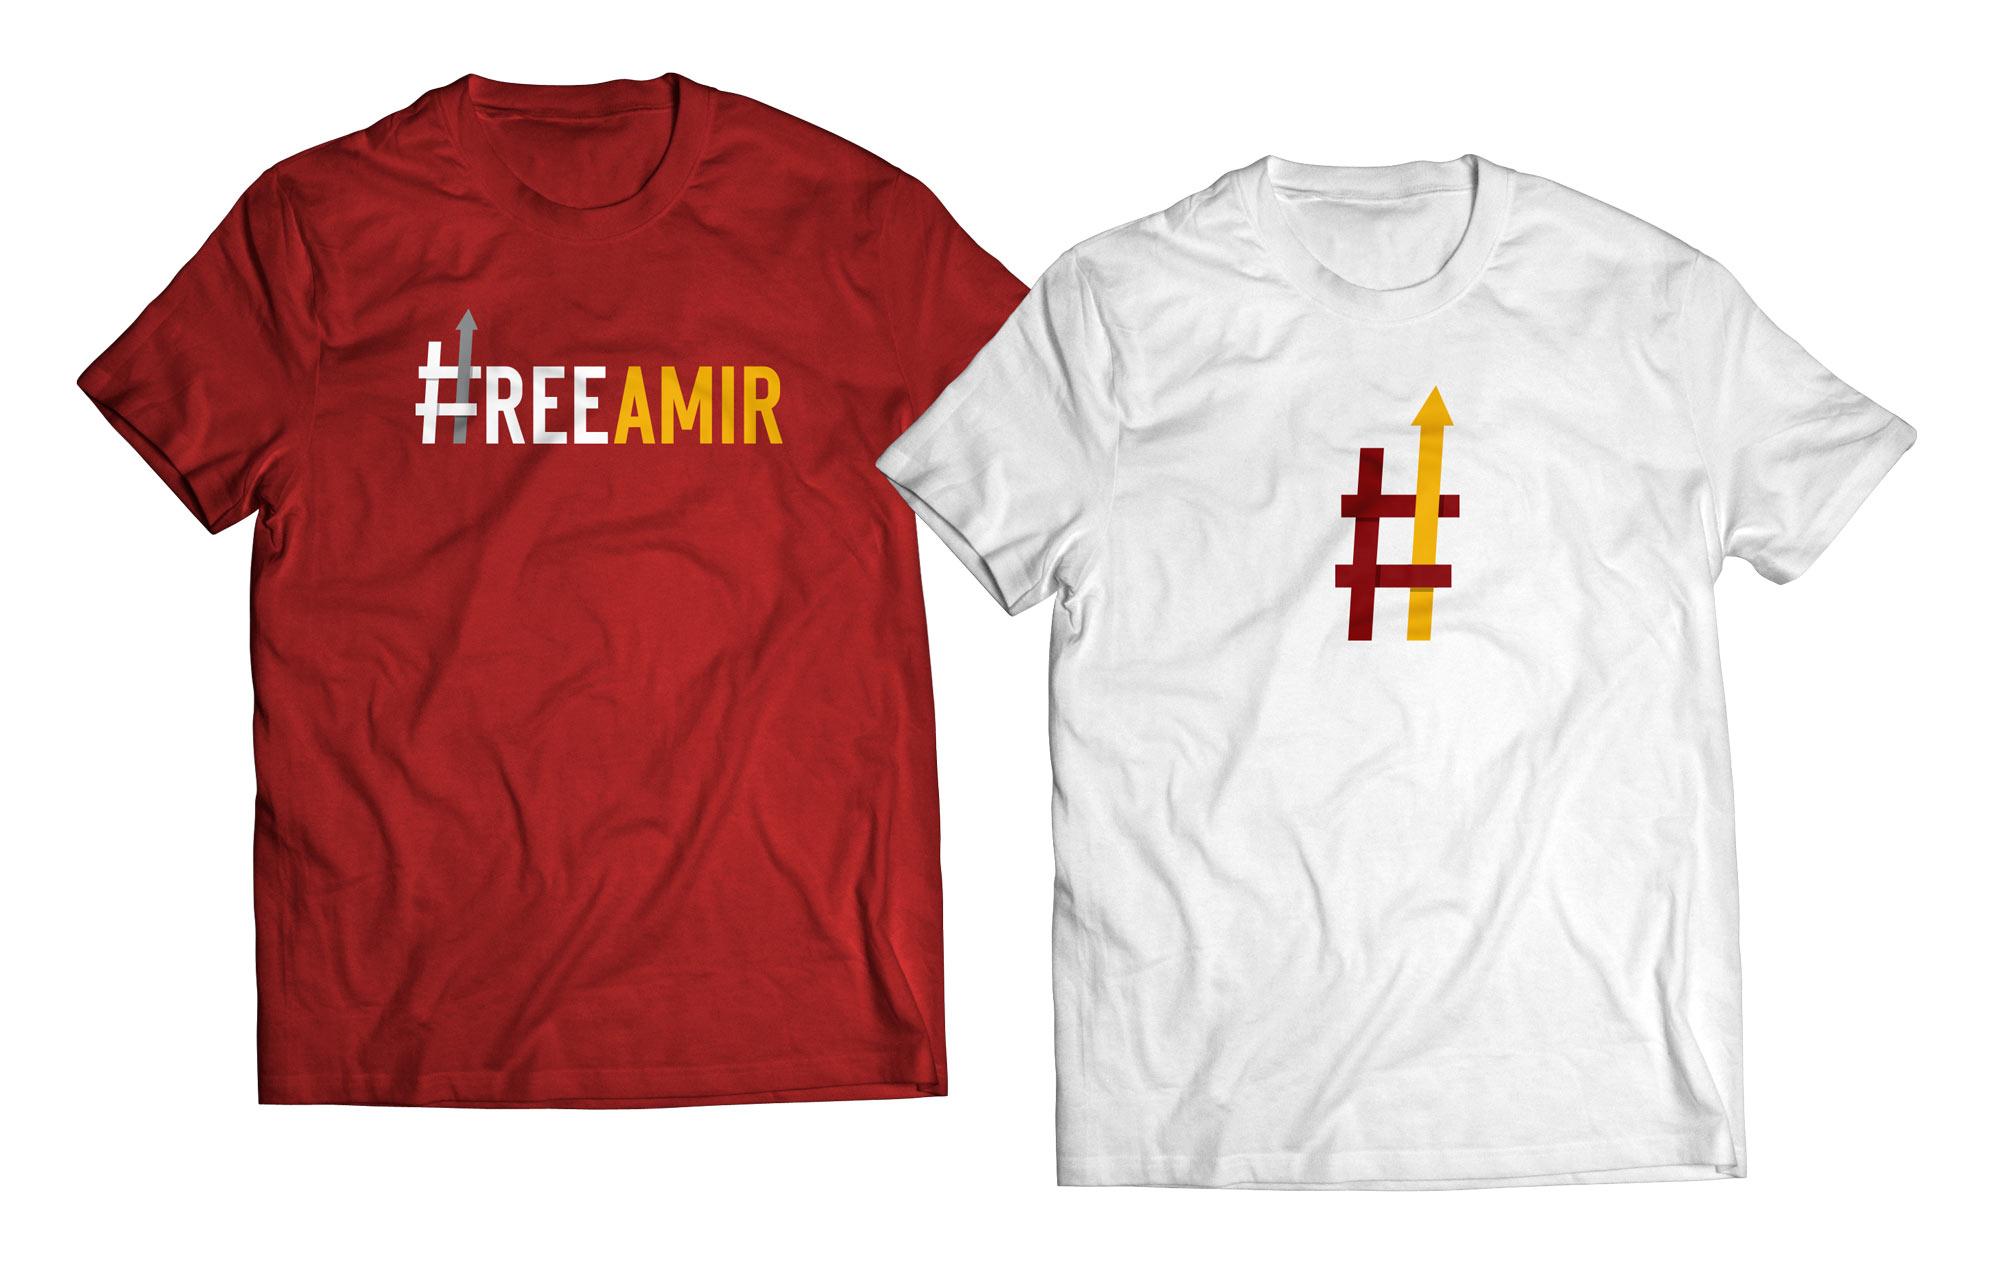 Free Amir t-shirts